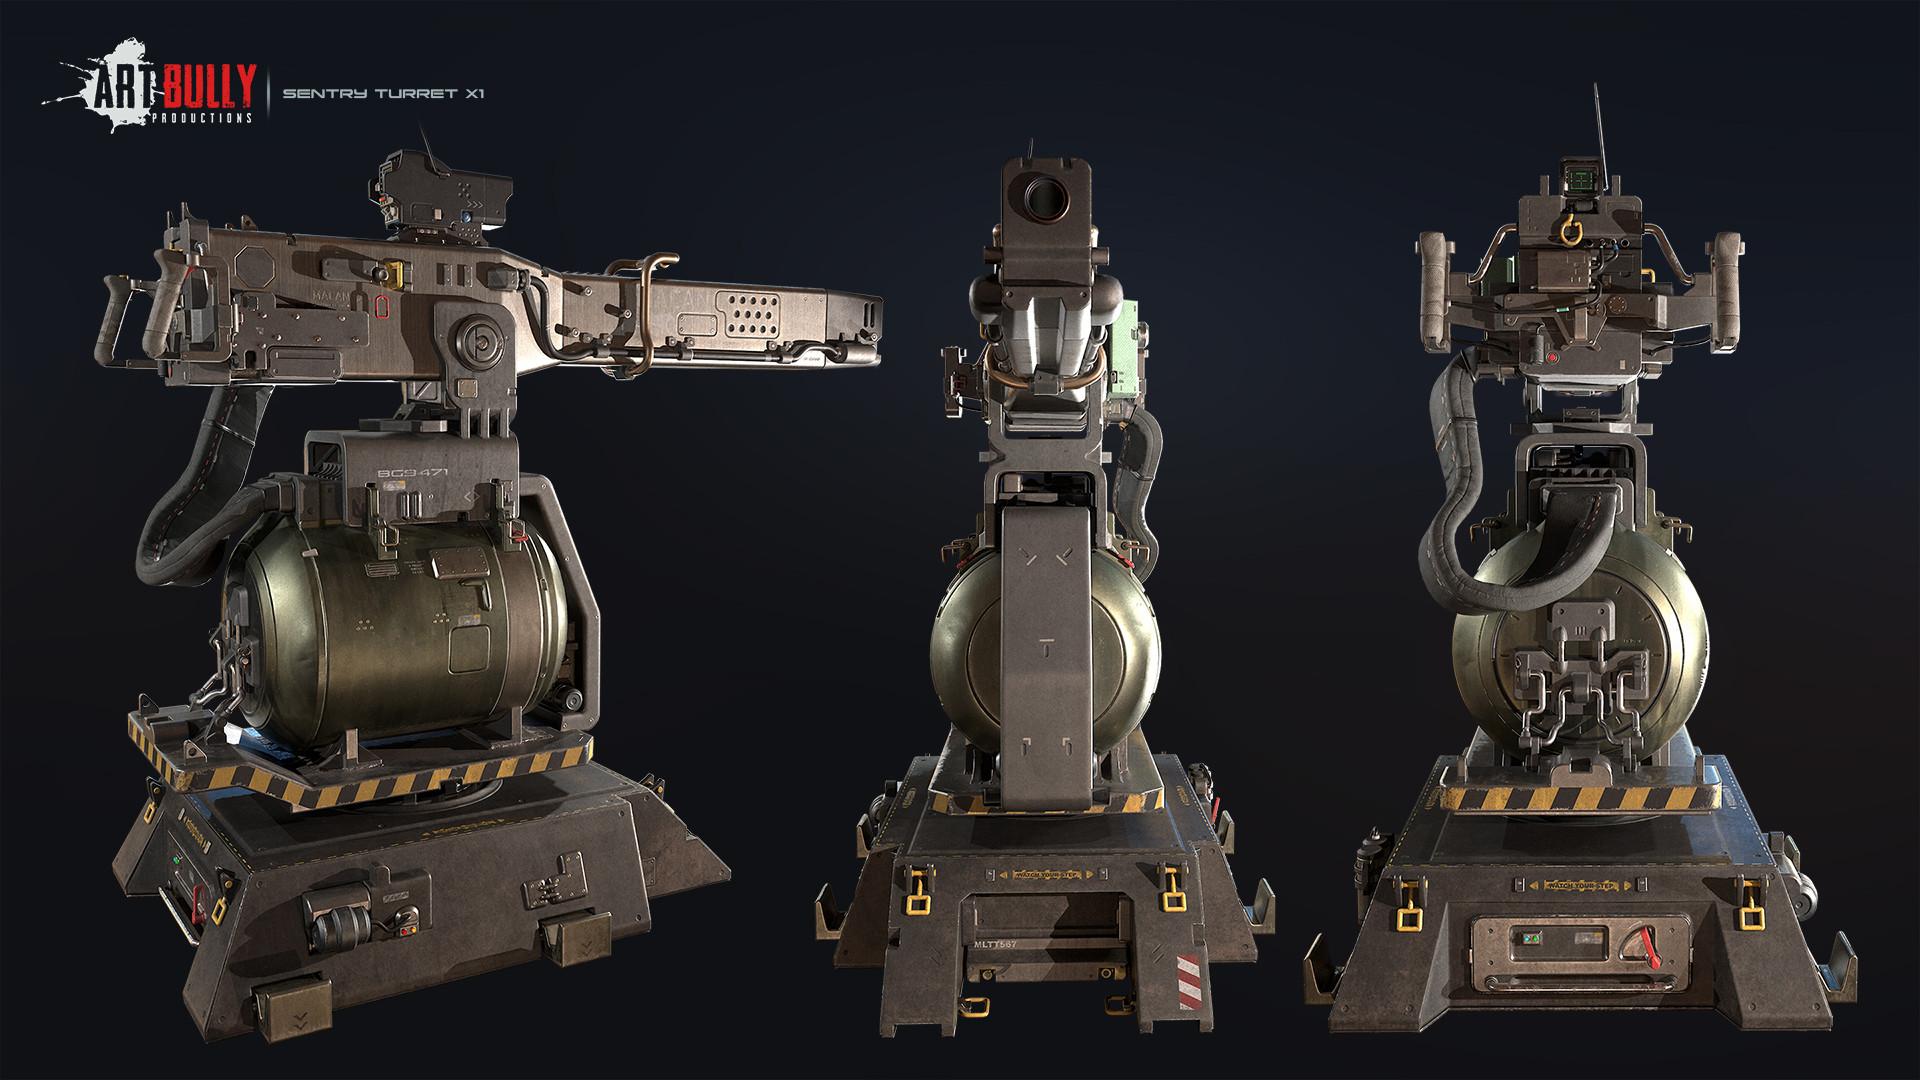 Patrick nuckels sentry turret x1 render 05